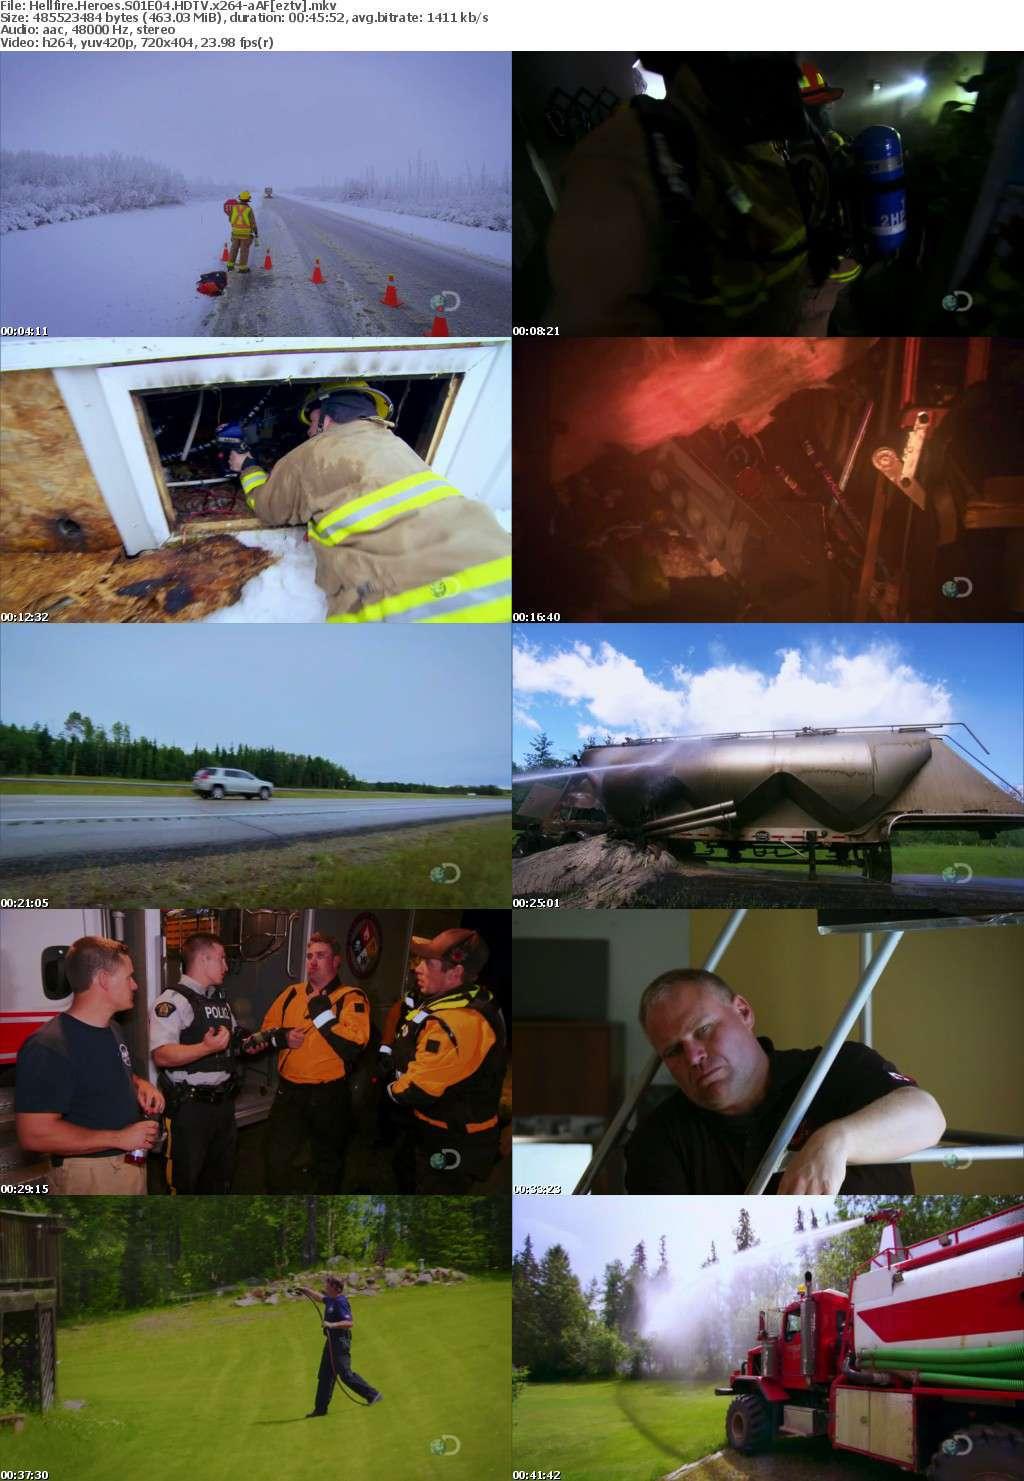 Hellfire Heroes S01E04 HDTV x264-aAF